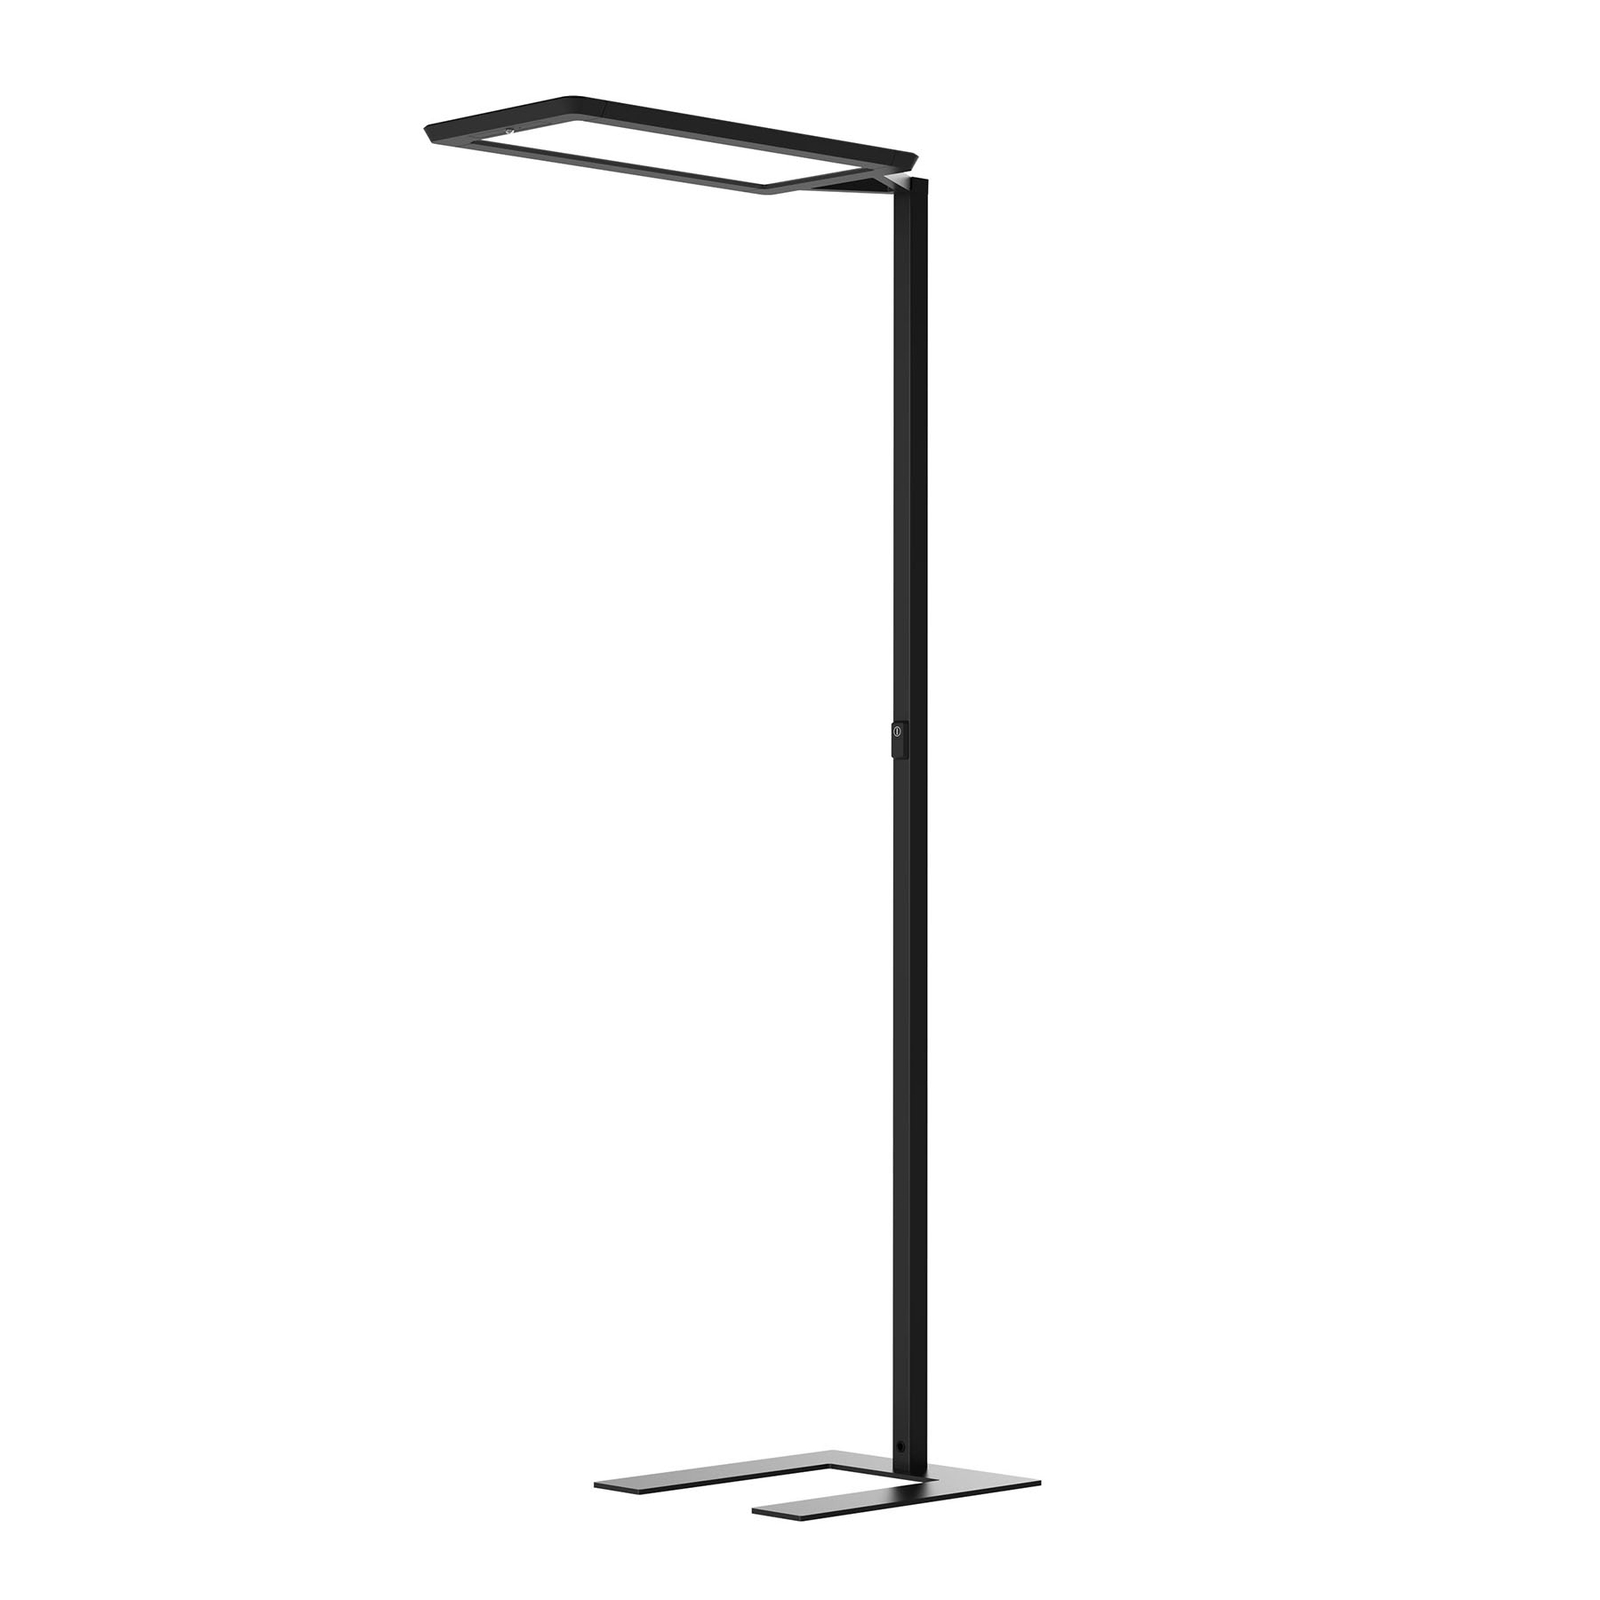 LED-Stehlampe Yara.single VTL, BT, PIR, schwarz